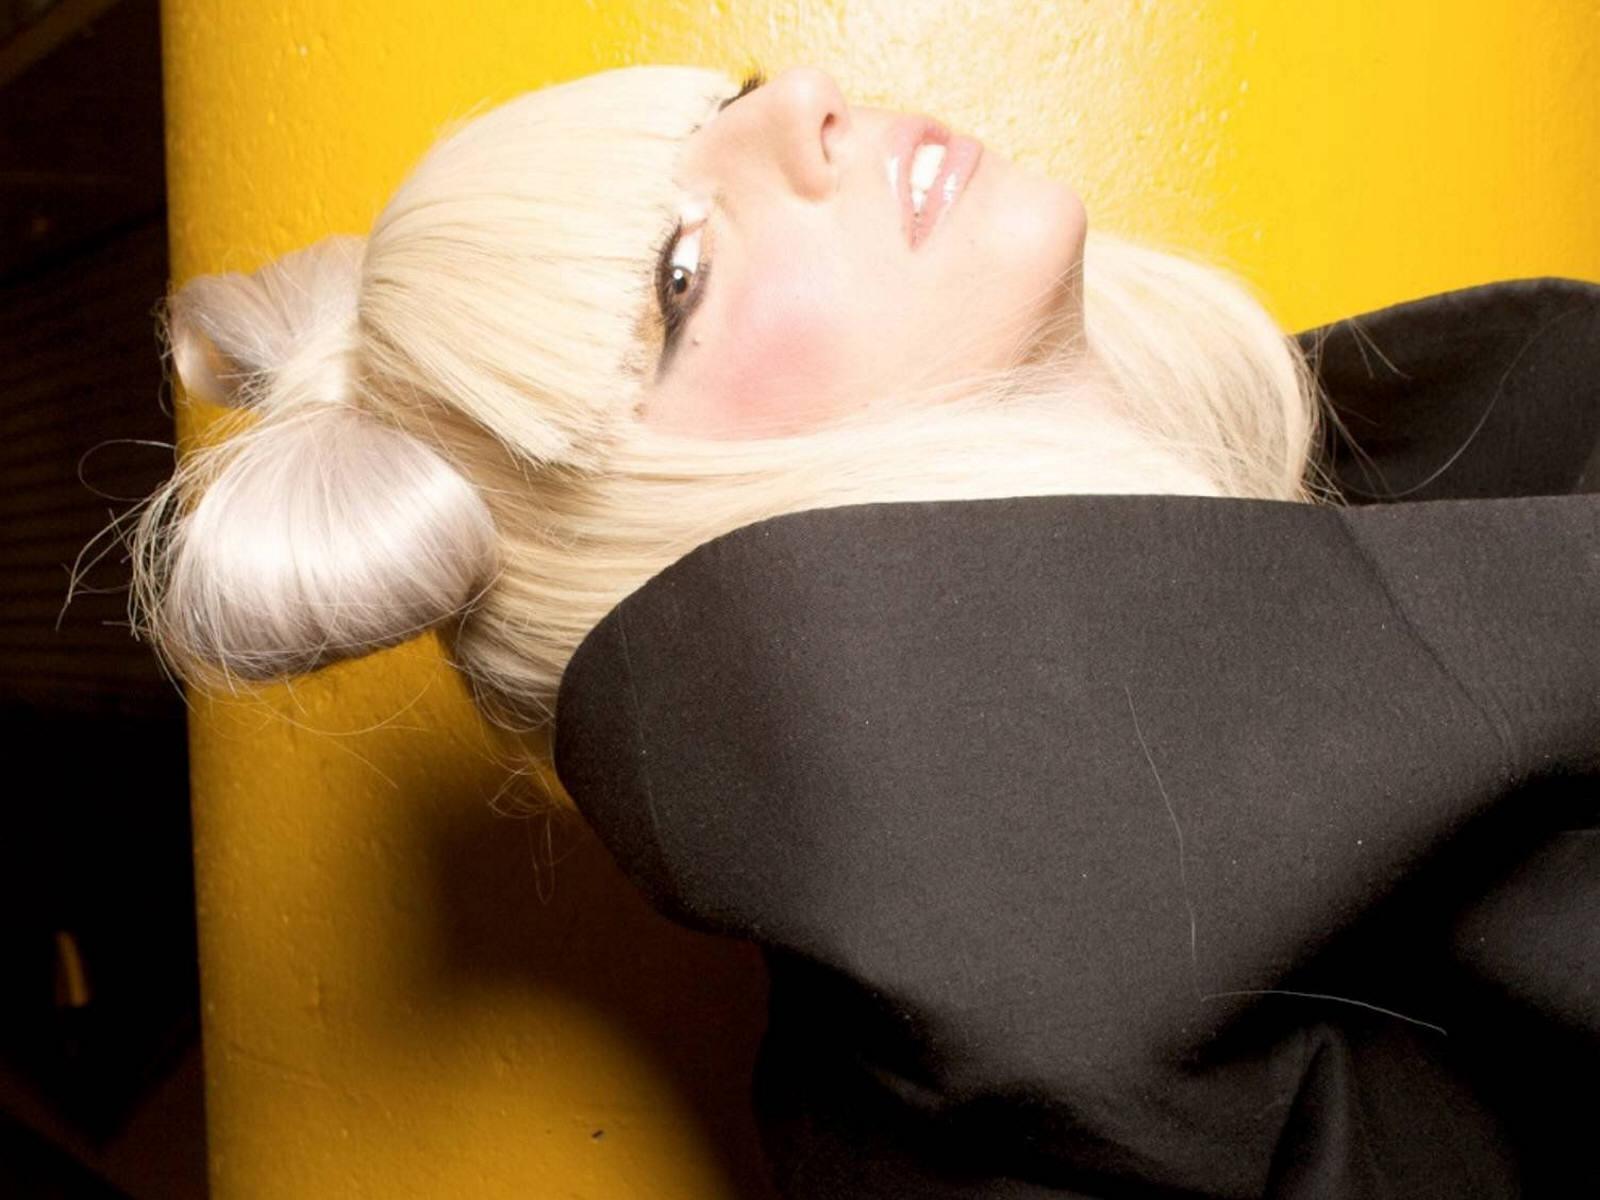 Sexy Lady Gaga দেওয়ালপত্র